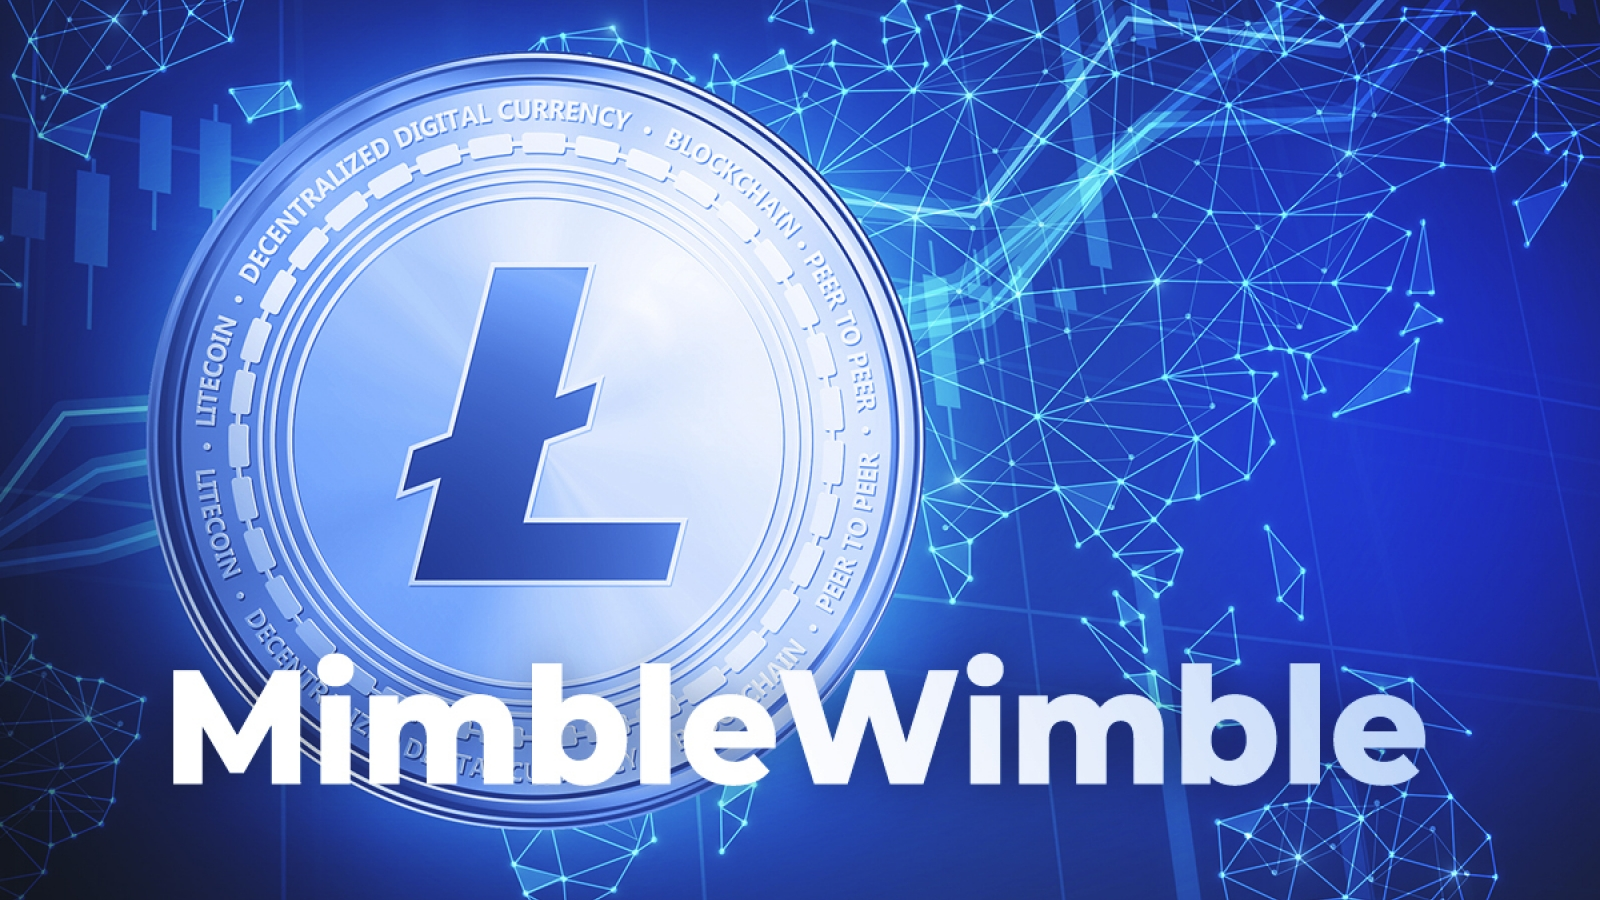 Litecoin'in LTC Beklenen Mimblewimble